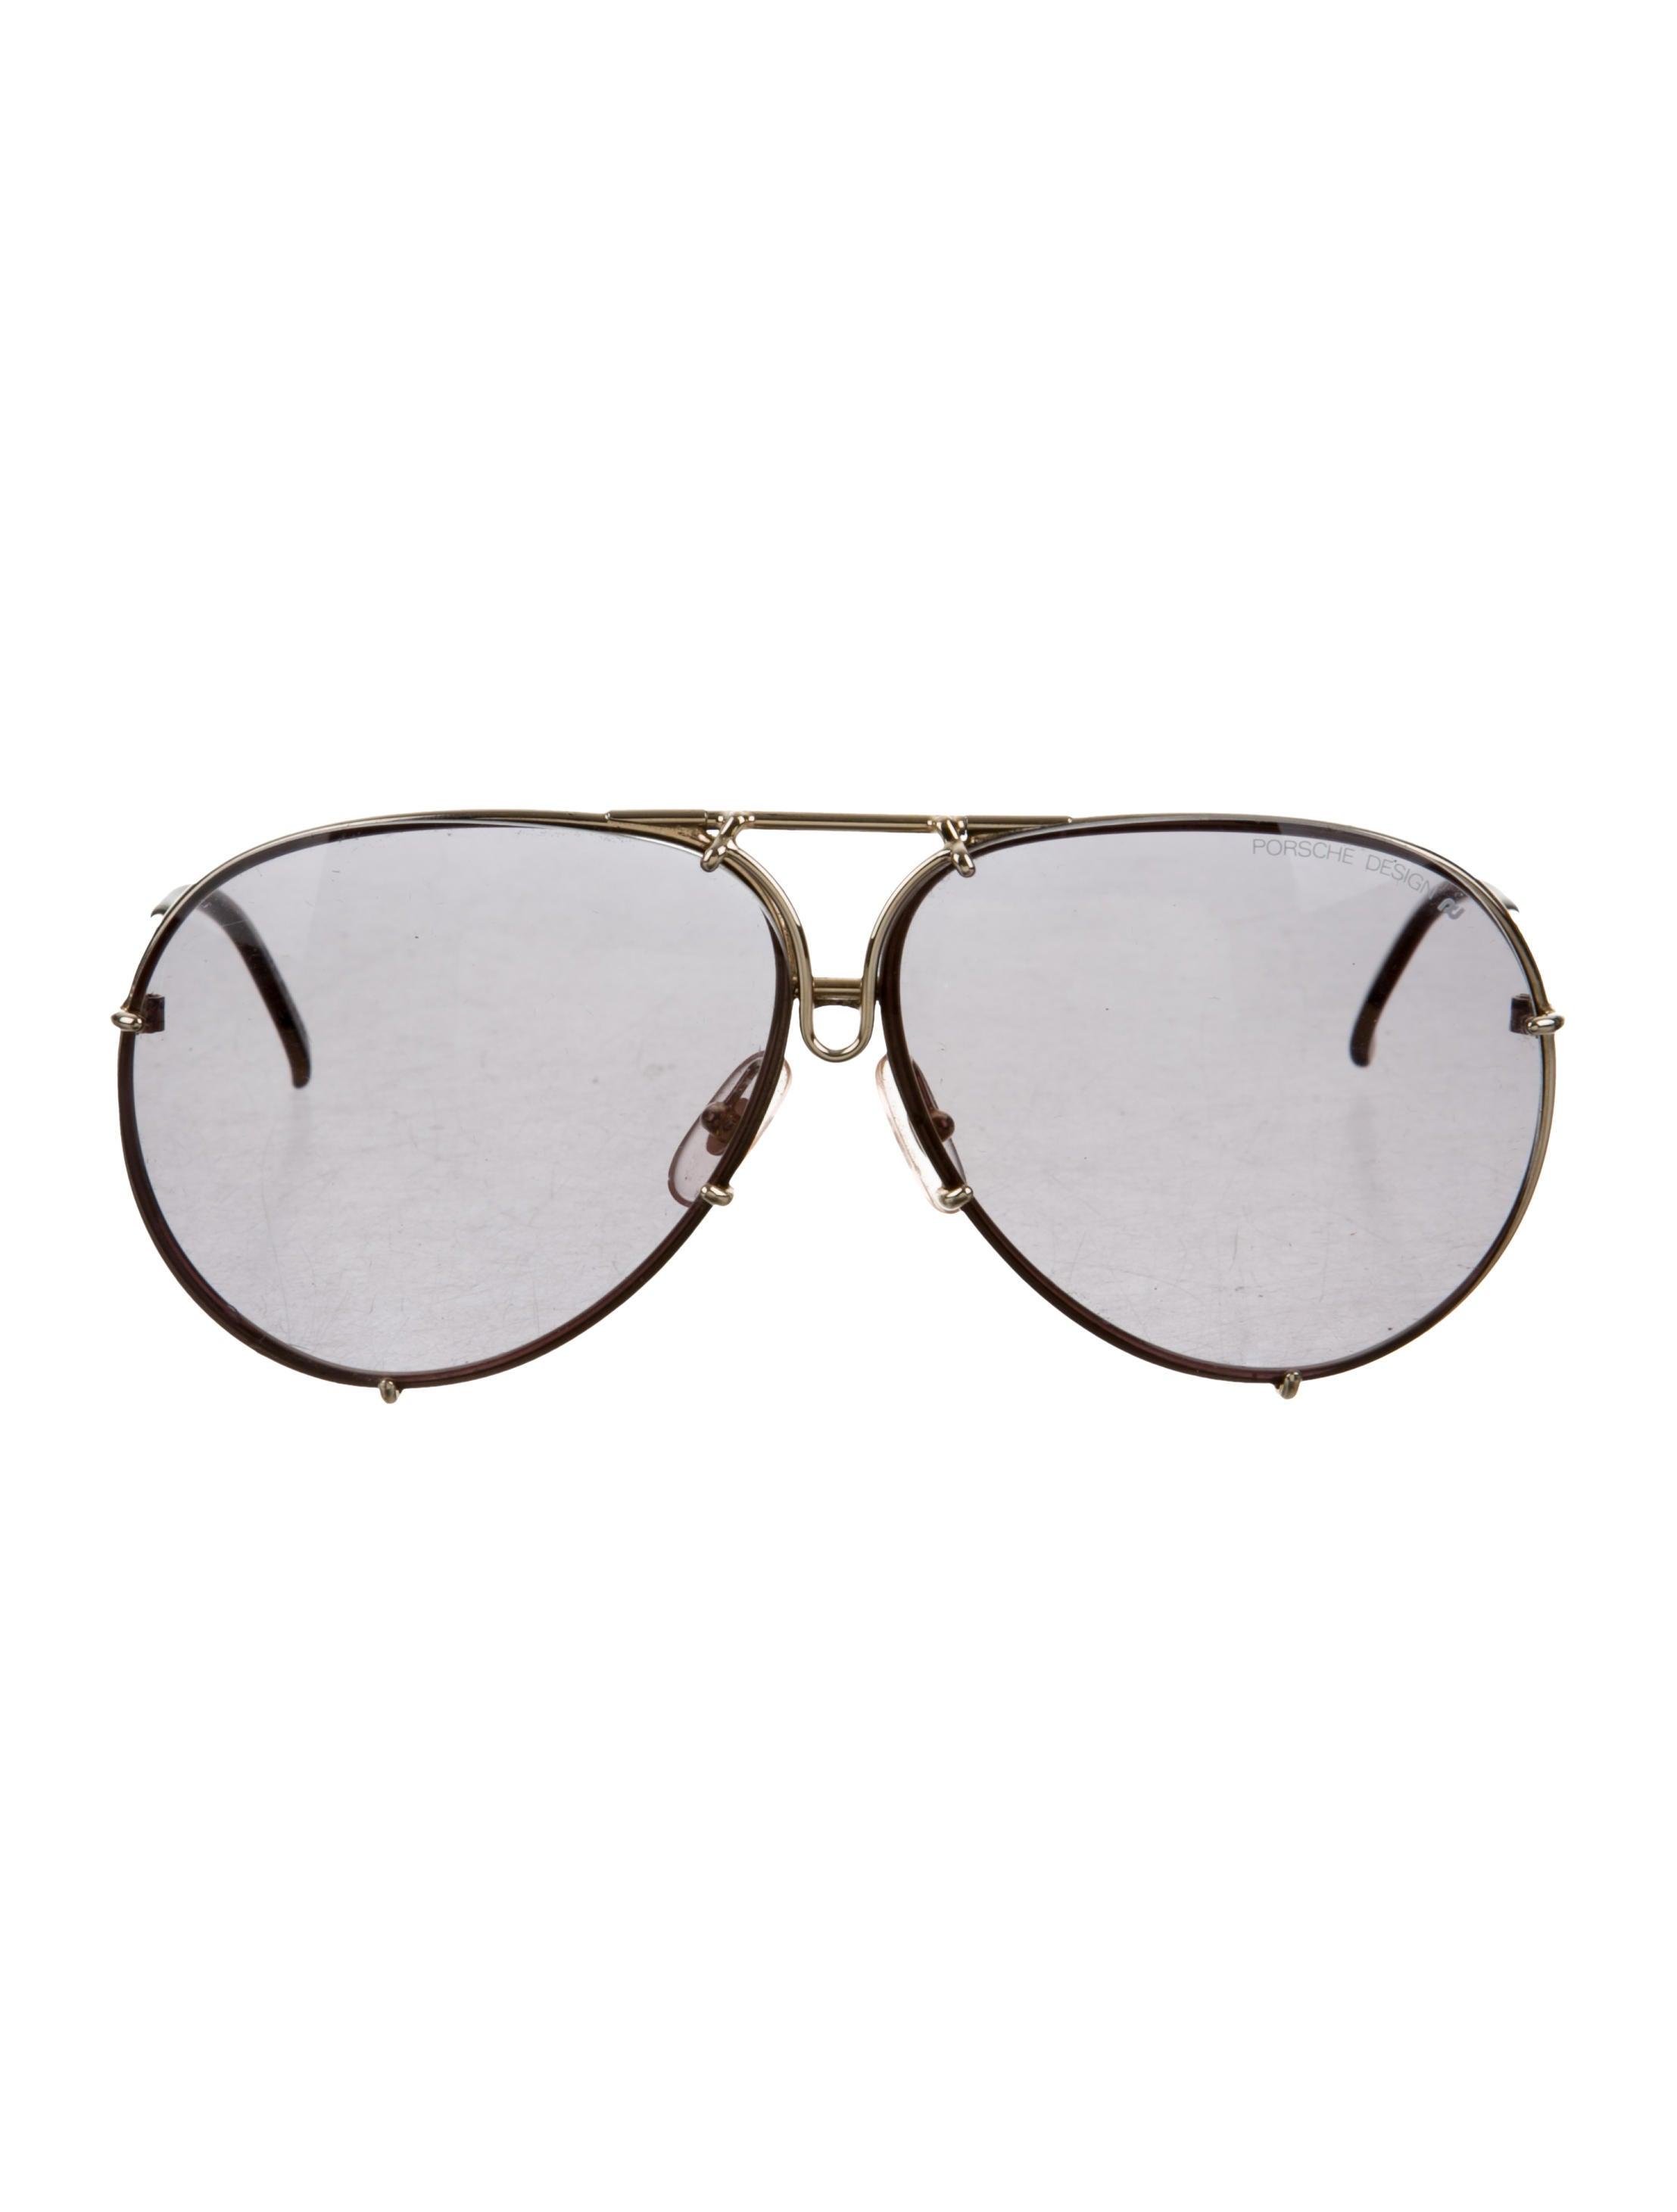 7c7a2f8a616 Porsche Design Oversize Aviator Sunglasses - Accessories - POD20089 ...